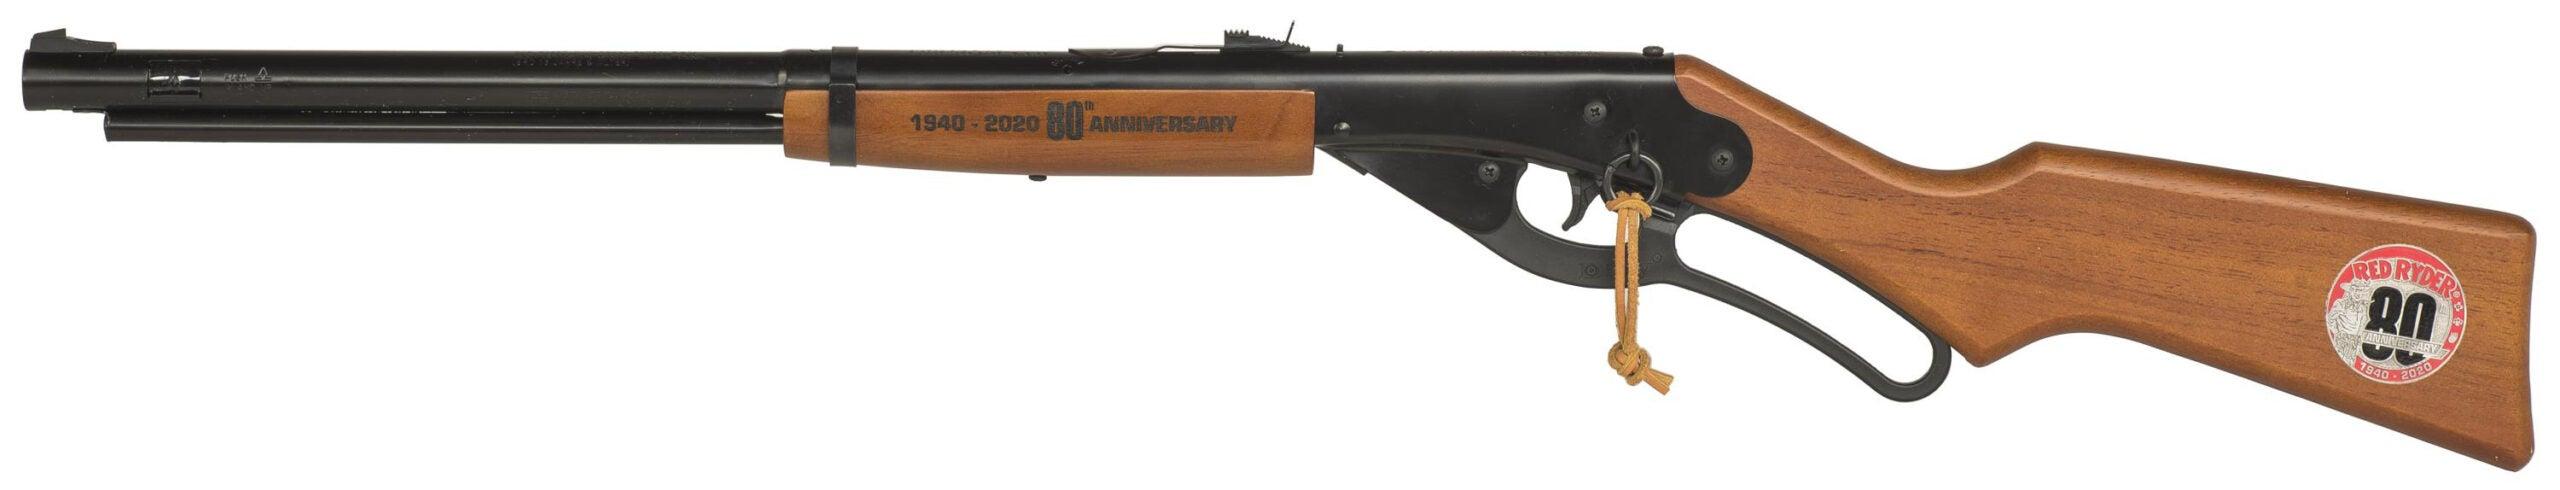 80th Anniversary Edition Daisy Red Ryder BB Gun